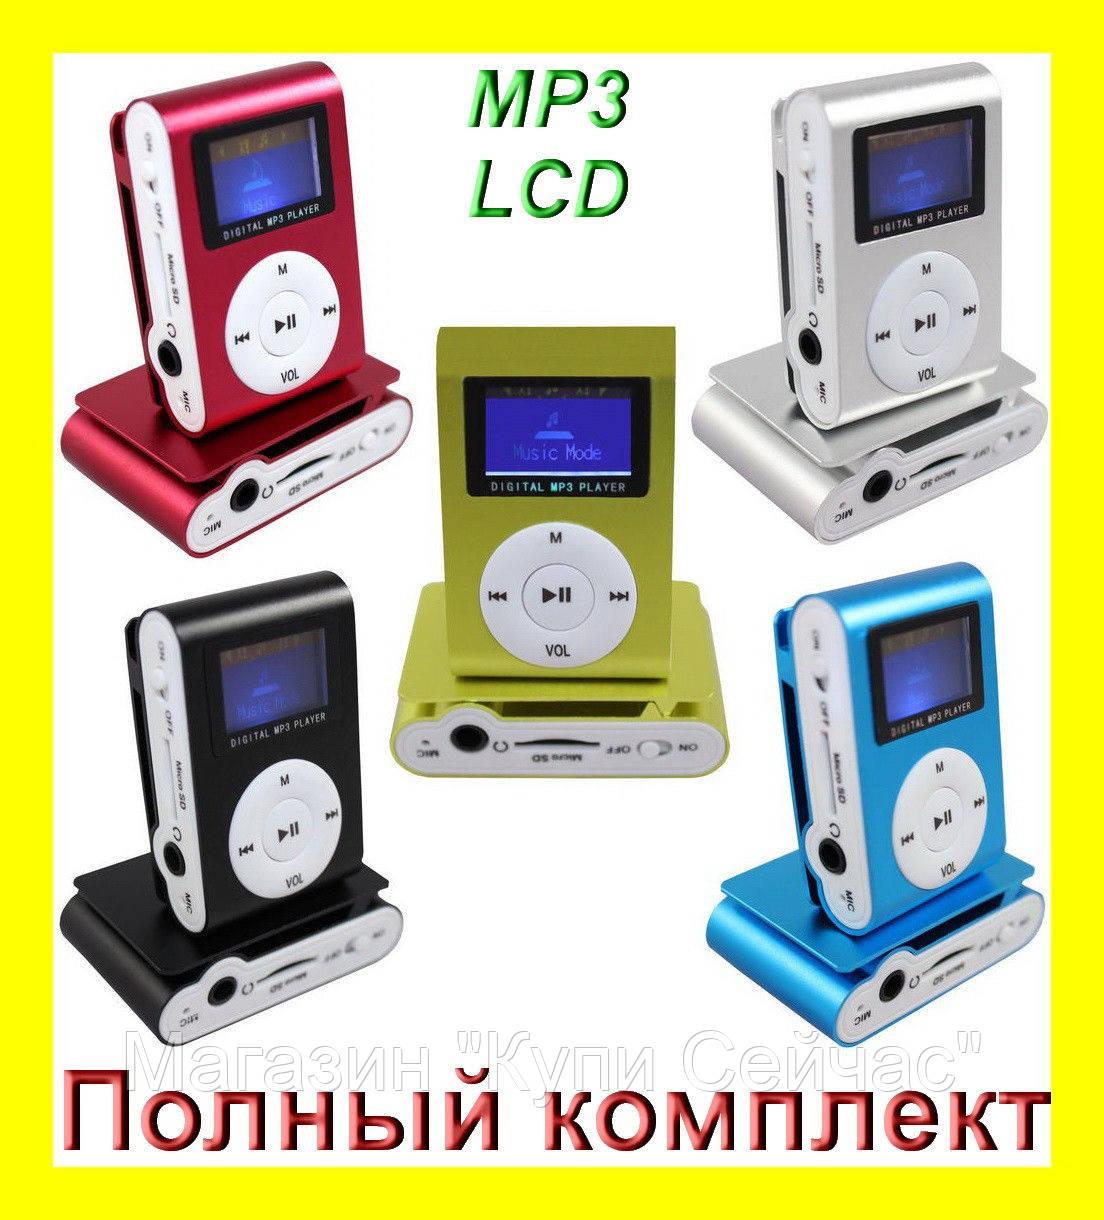 "MP3 с LCD, FM-радио USB, Наушники, Коробка!Опт - Магазин ""Купи Сейчас"" в Одессе"